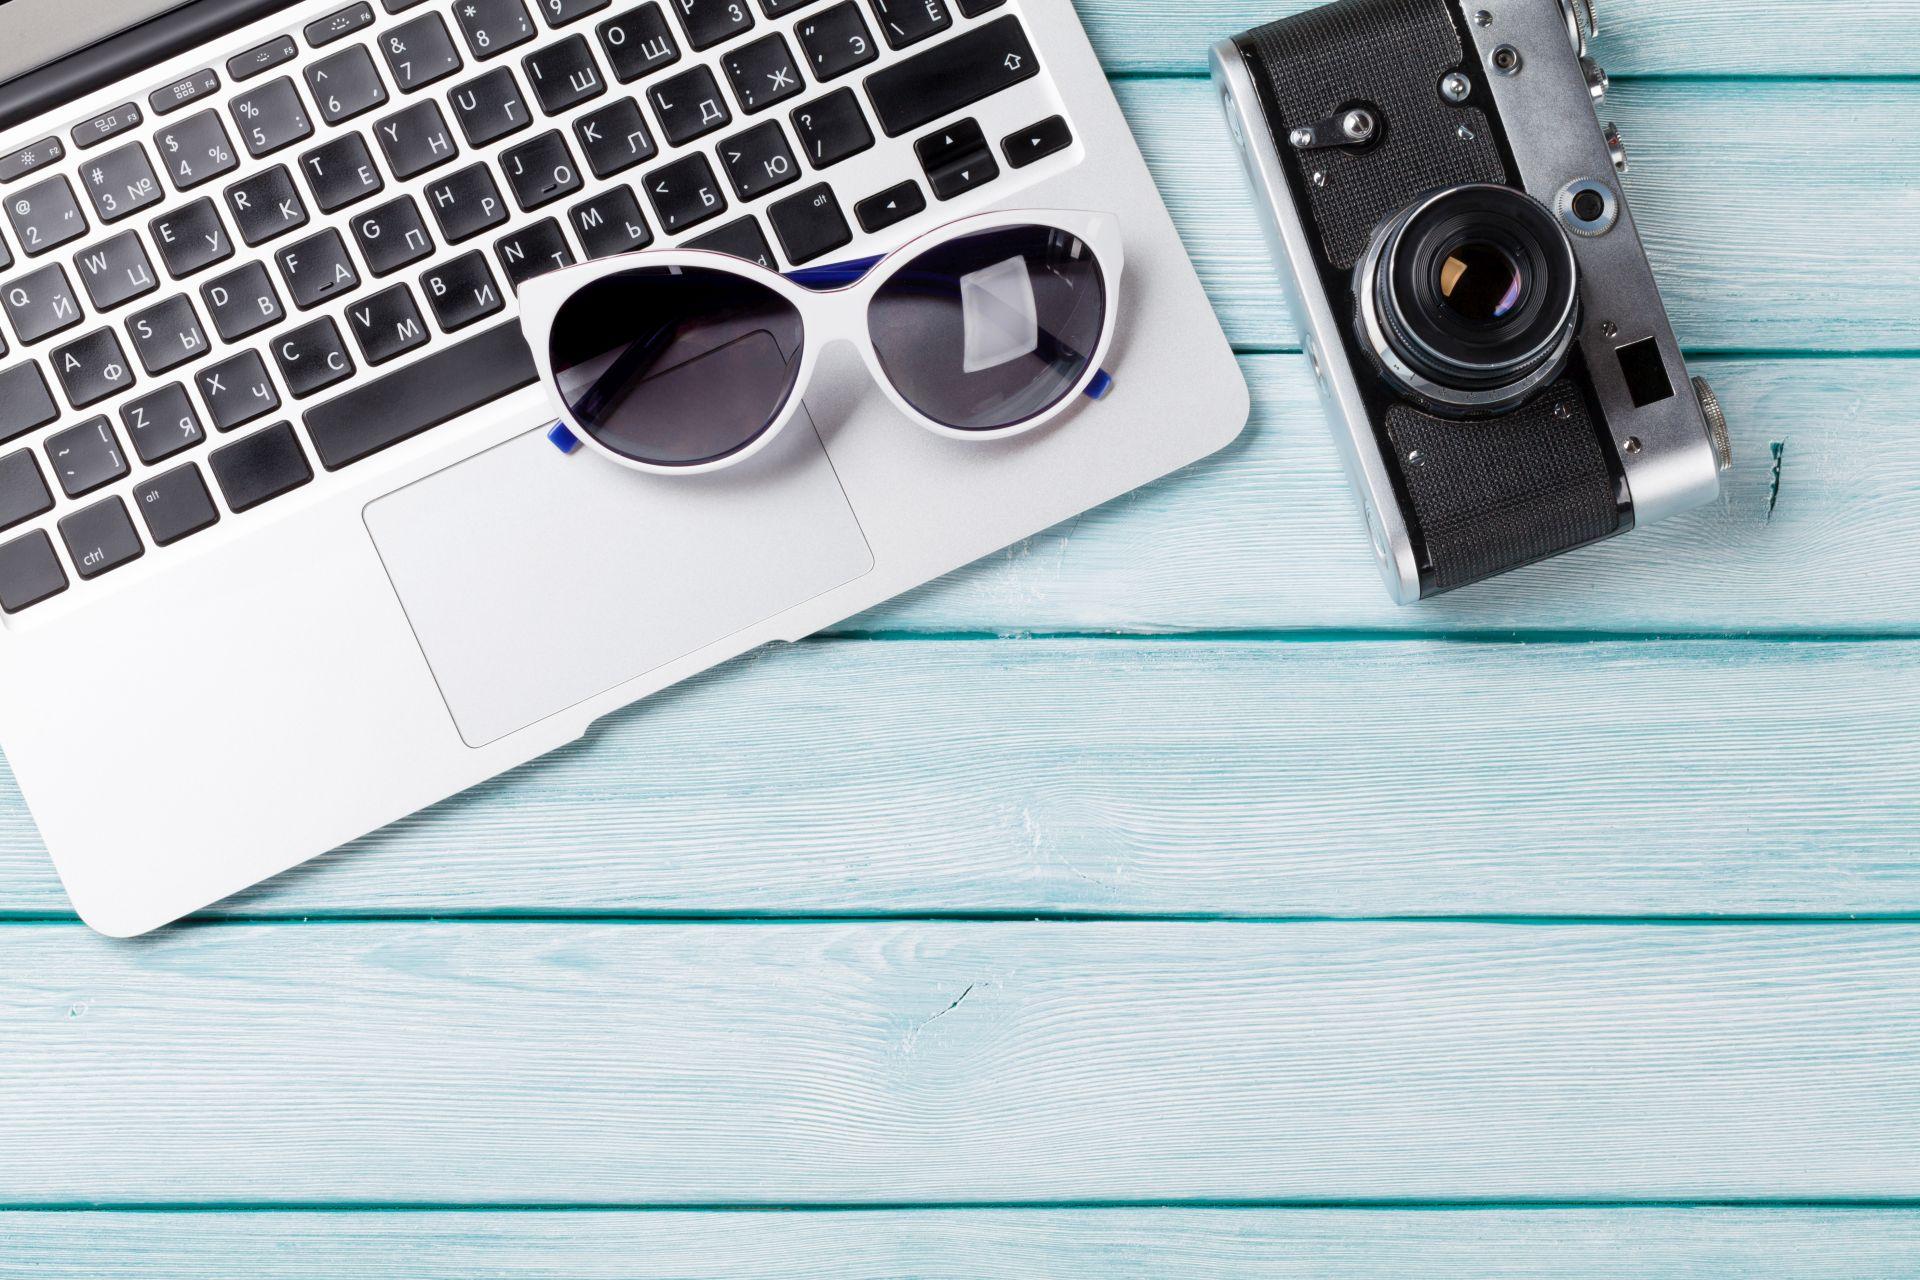 laptop i aparat fotograficzny